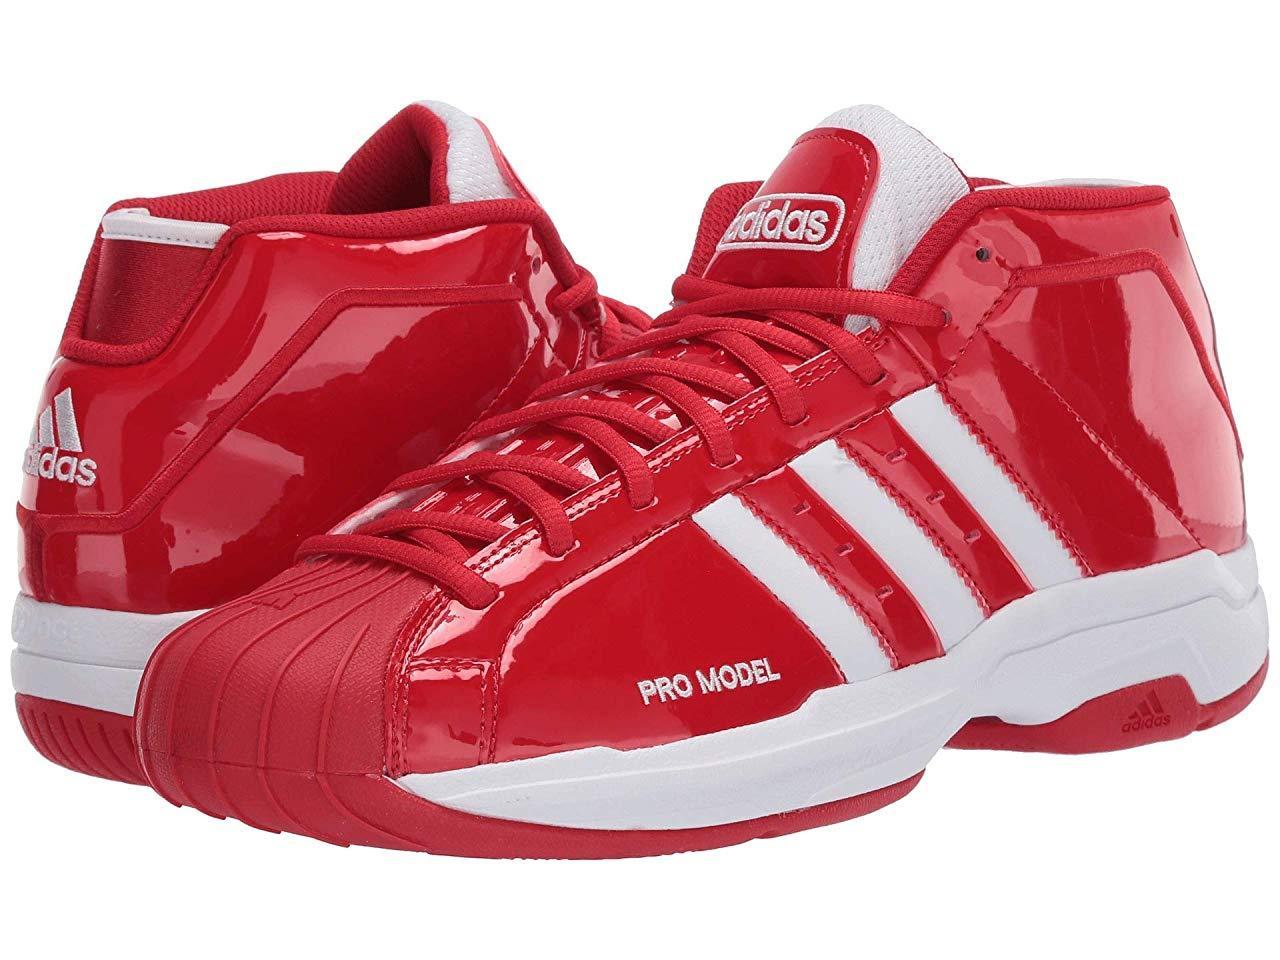 Кроссовки/Кеды adidas Pro Model 2G Scarlet/Footwear White/Scarlet